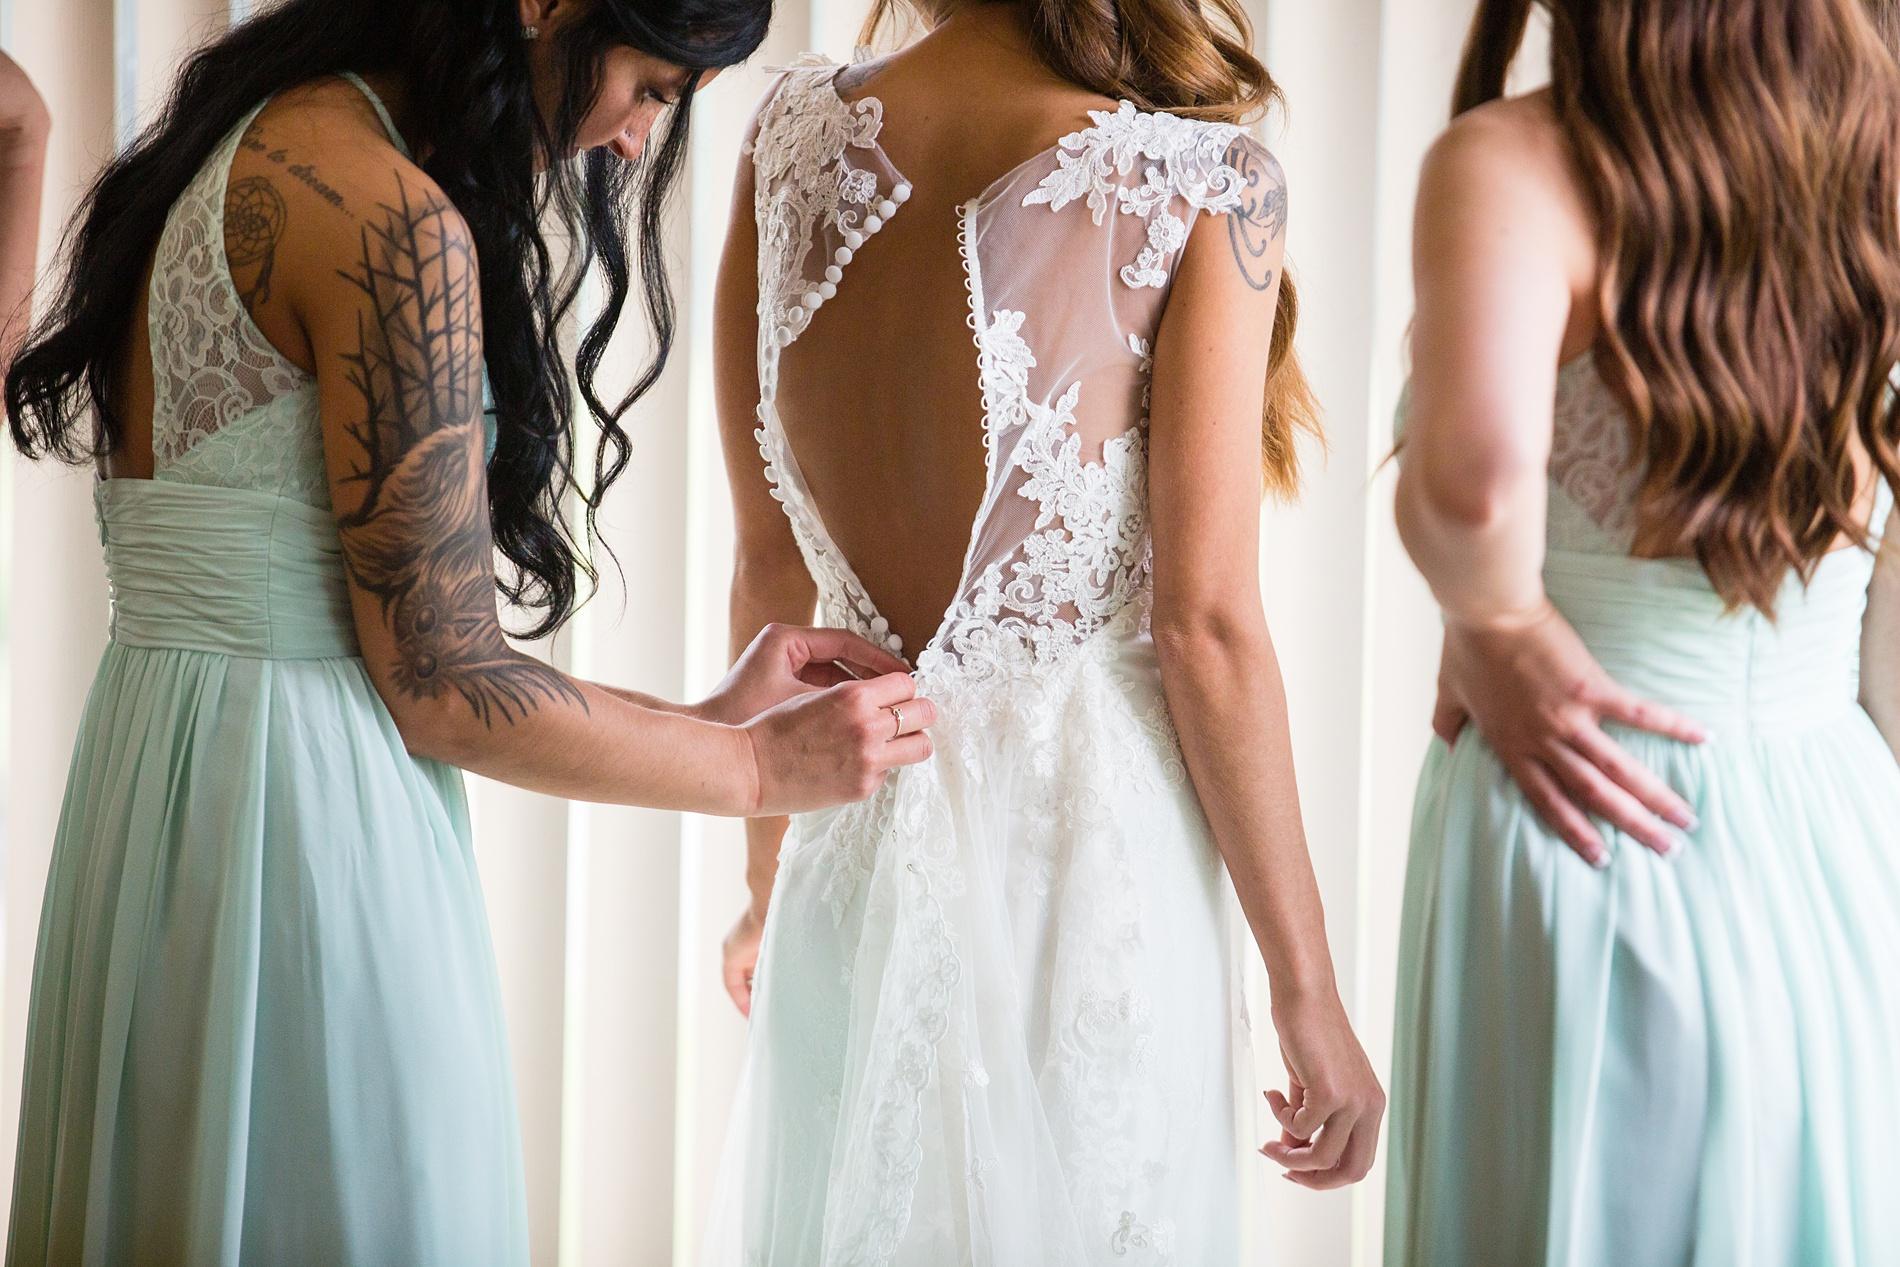 Brandon_Shafer_Photography_Brett_Autumn_Wedding_0024.jpg